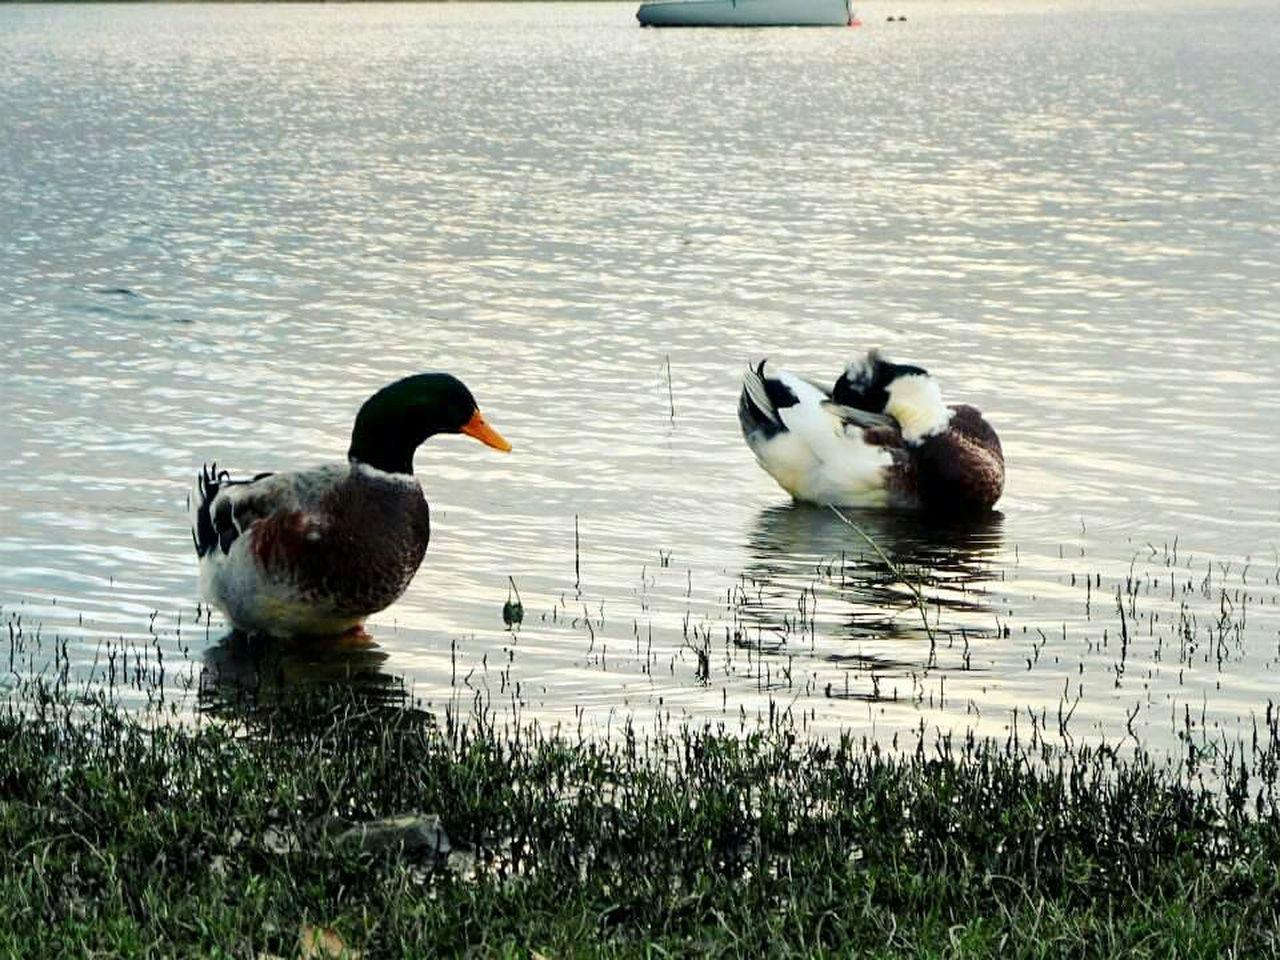 Costa azul, Villa Carlos Paz Ducks At The Lake Duck Family Nature